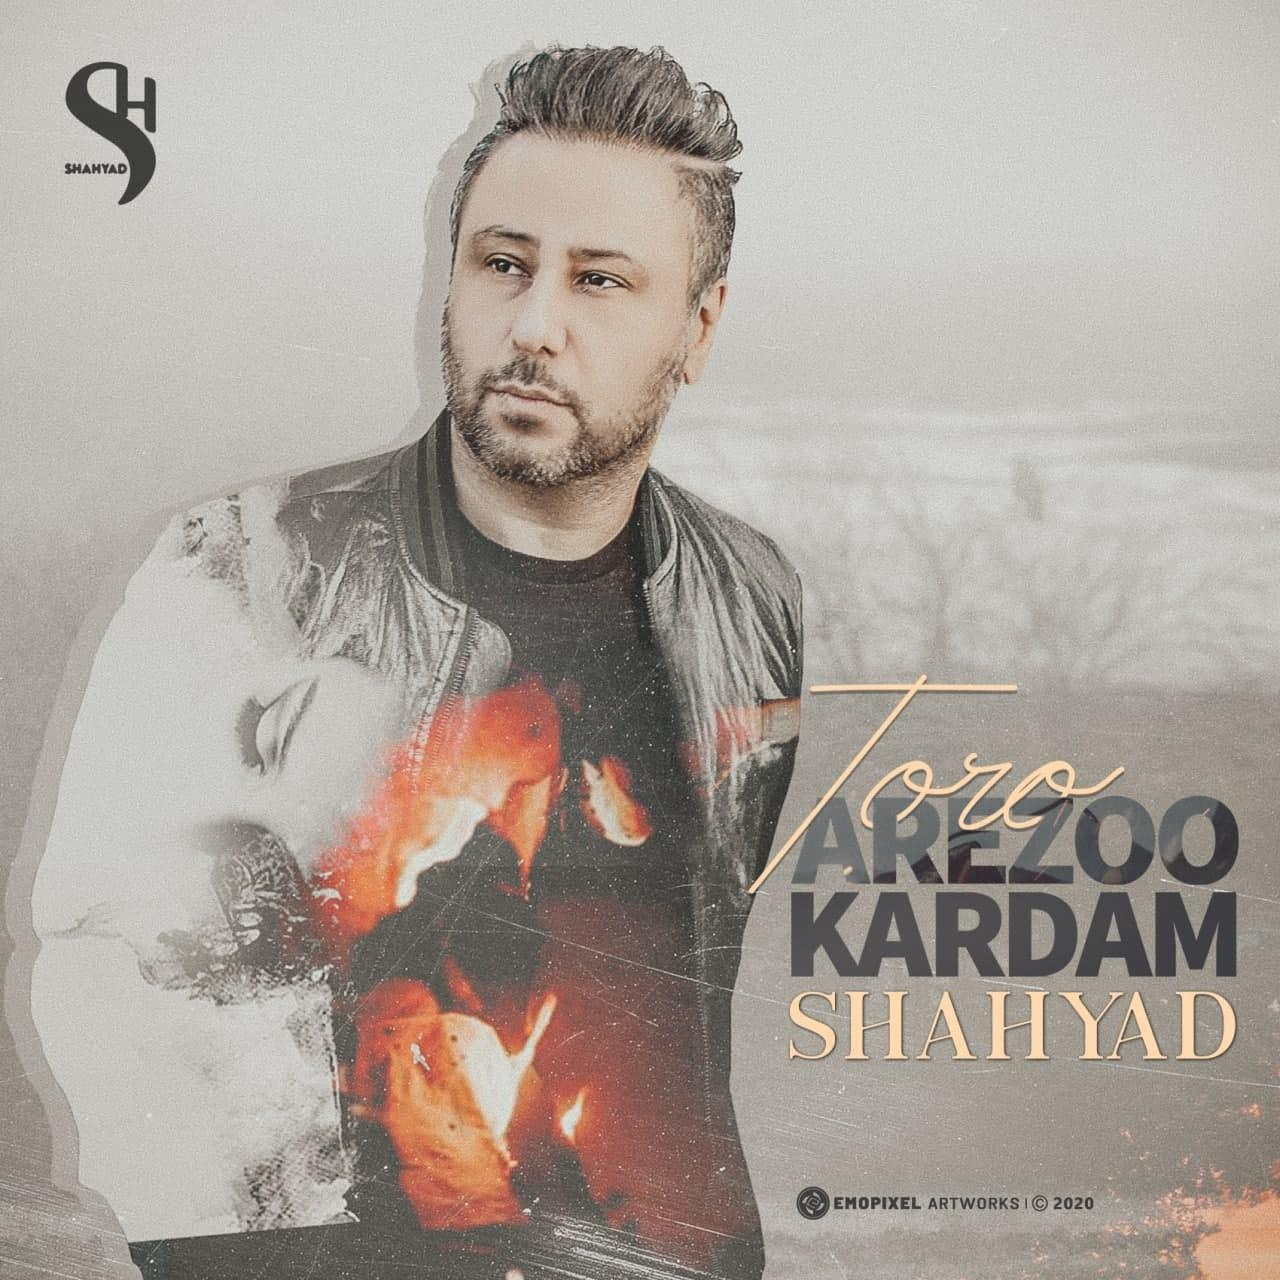 Shahyad – To Ro Arezoo Kardam